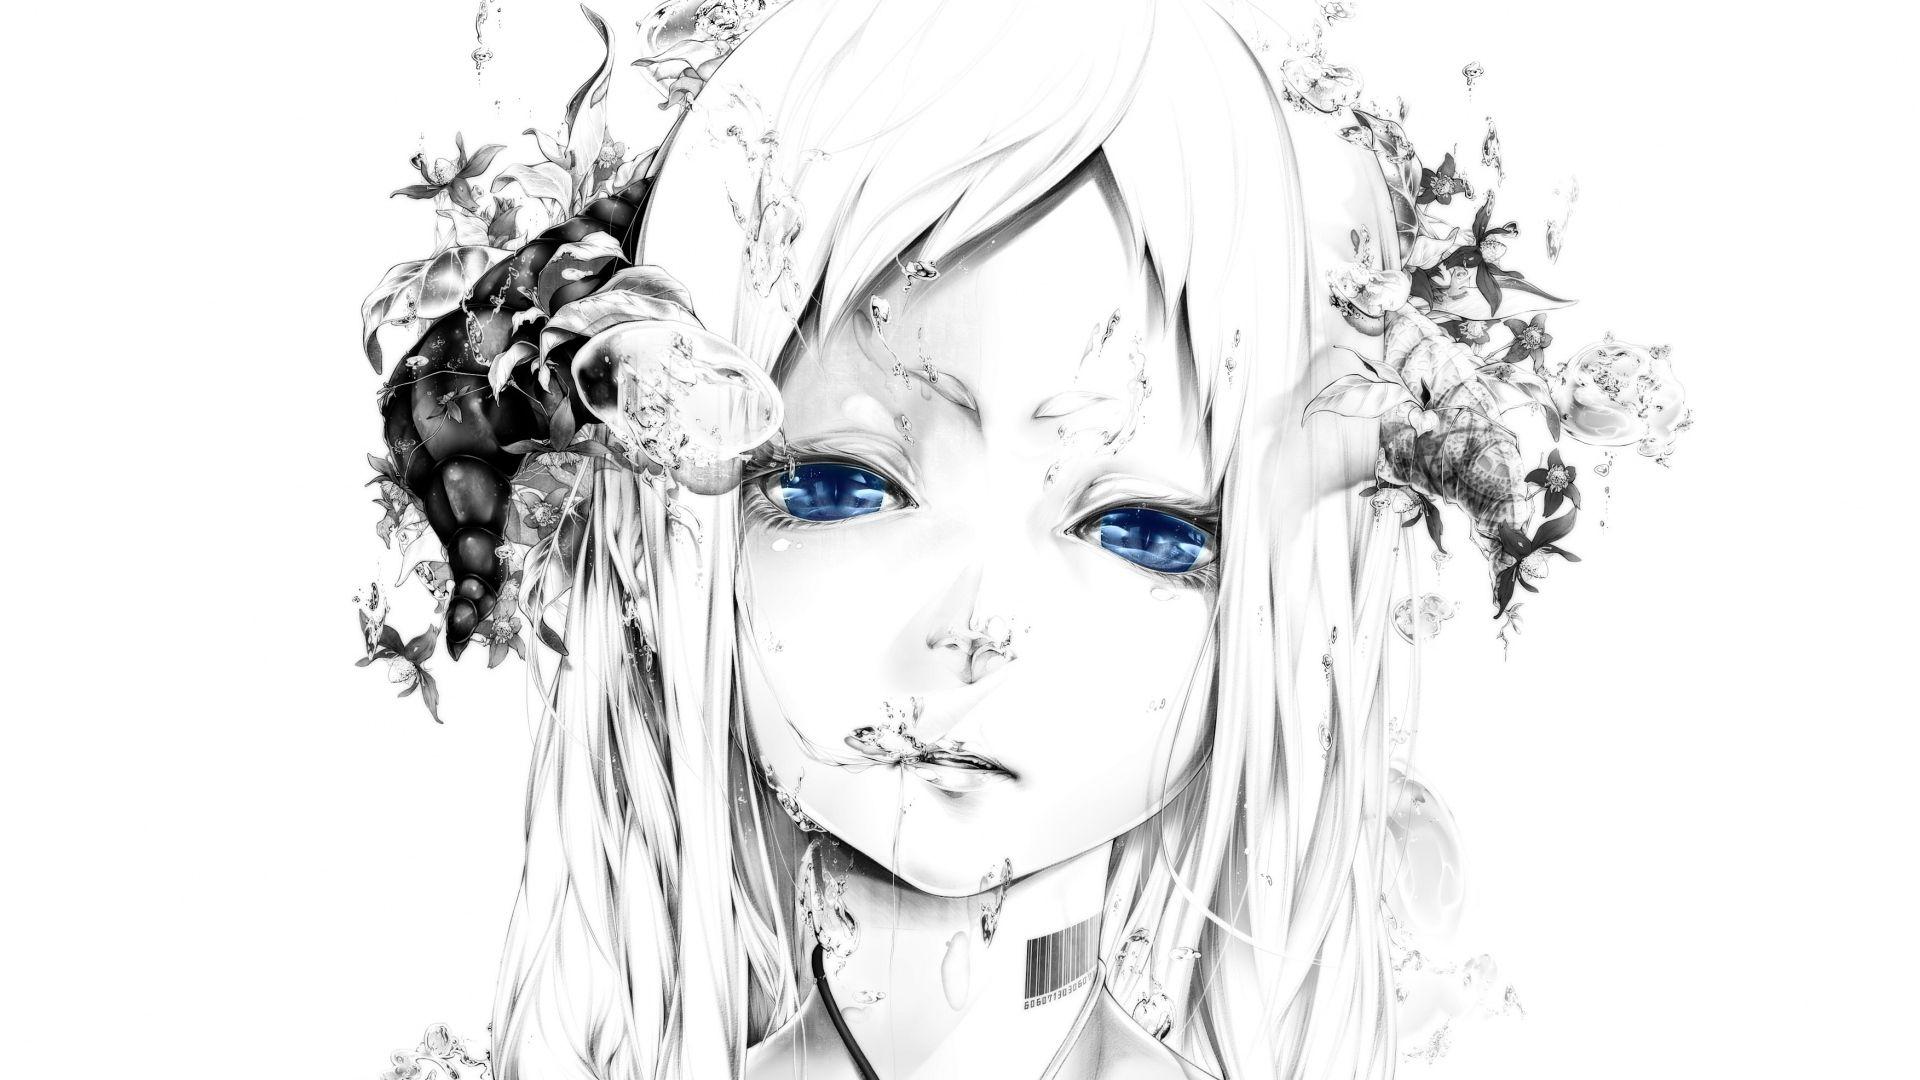 1920x1080 Wallpaper Art Bouno Satoshi Girl Face White Background Graphic Monochrome Blue Eyes Water Bubbles Barcode